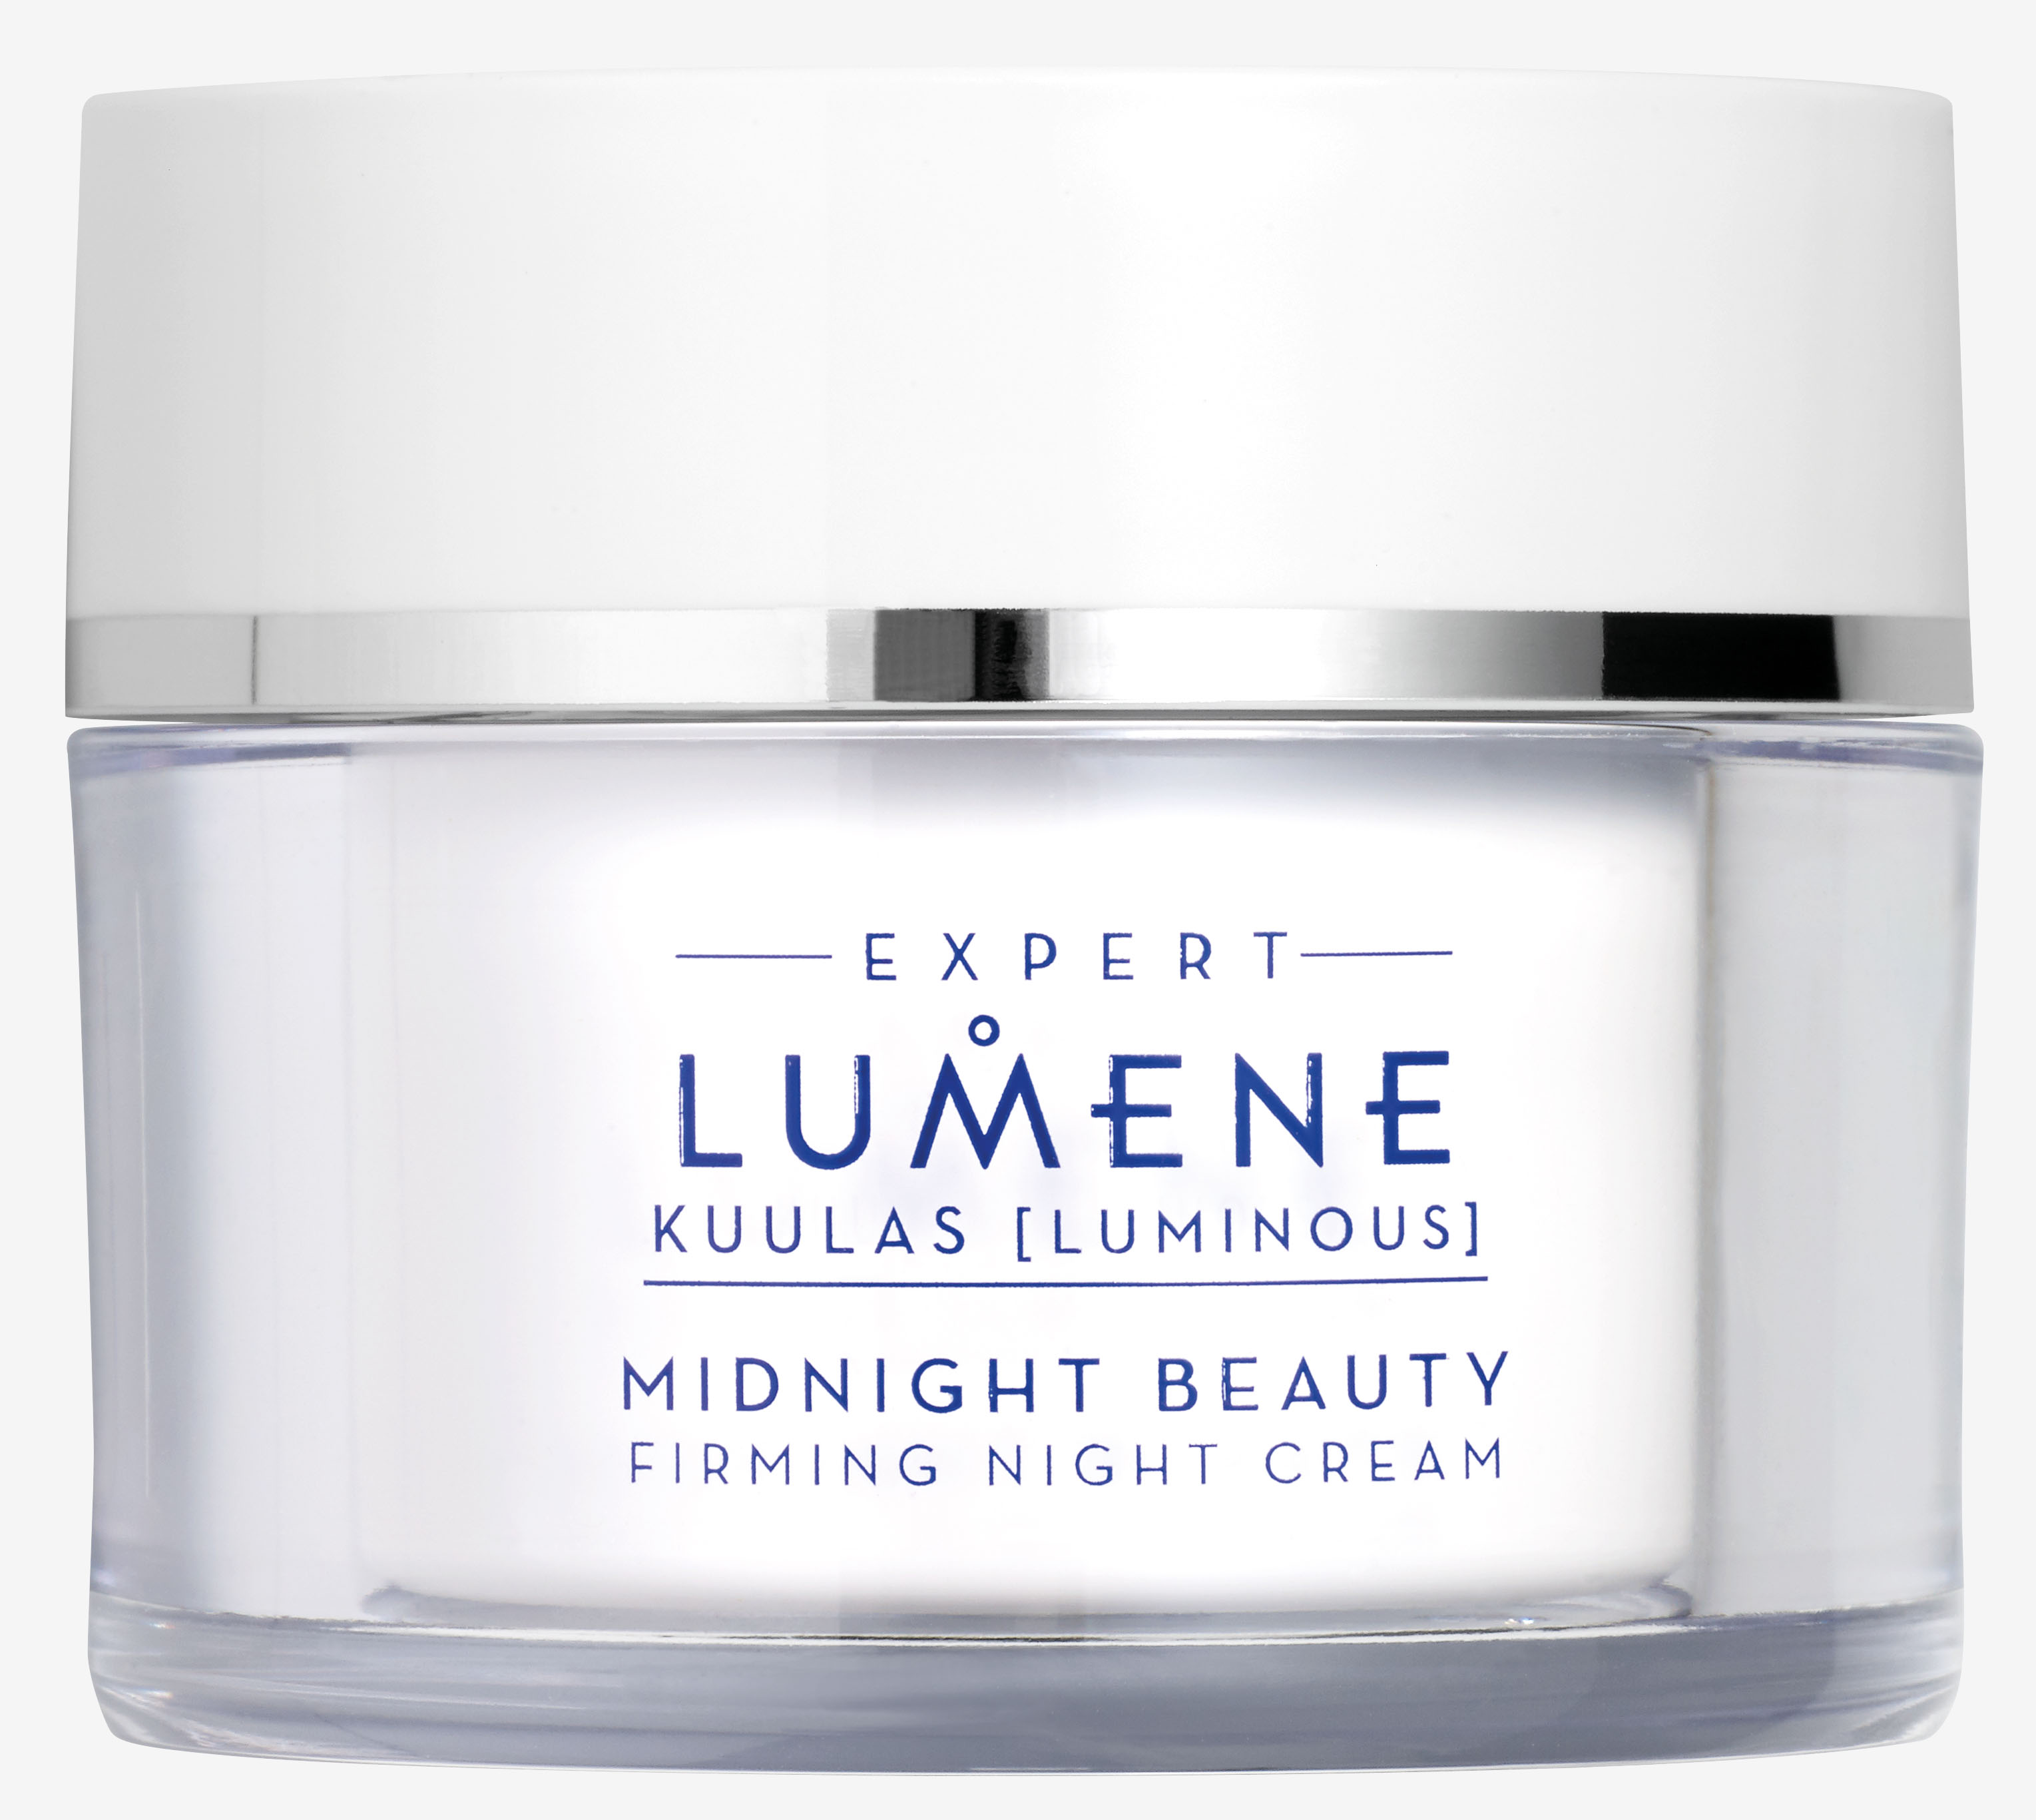 Lumene Kuulas Укрепляющий ночной крем-уход для красоты кожи, 50 мл